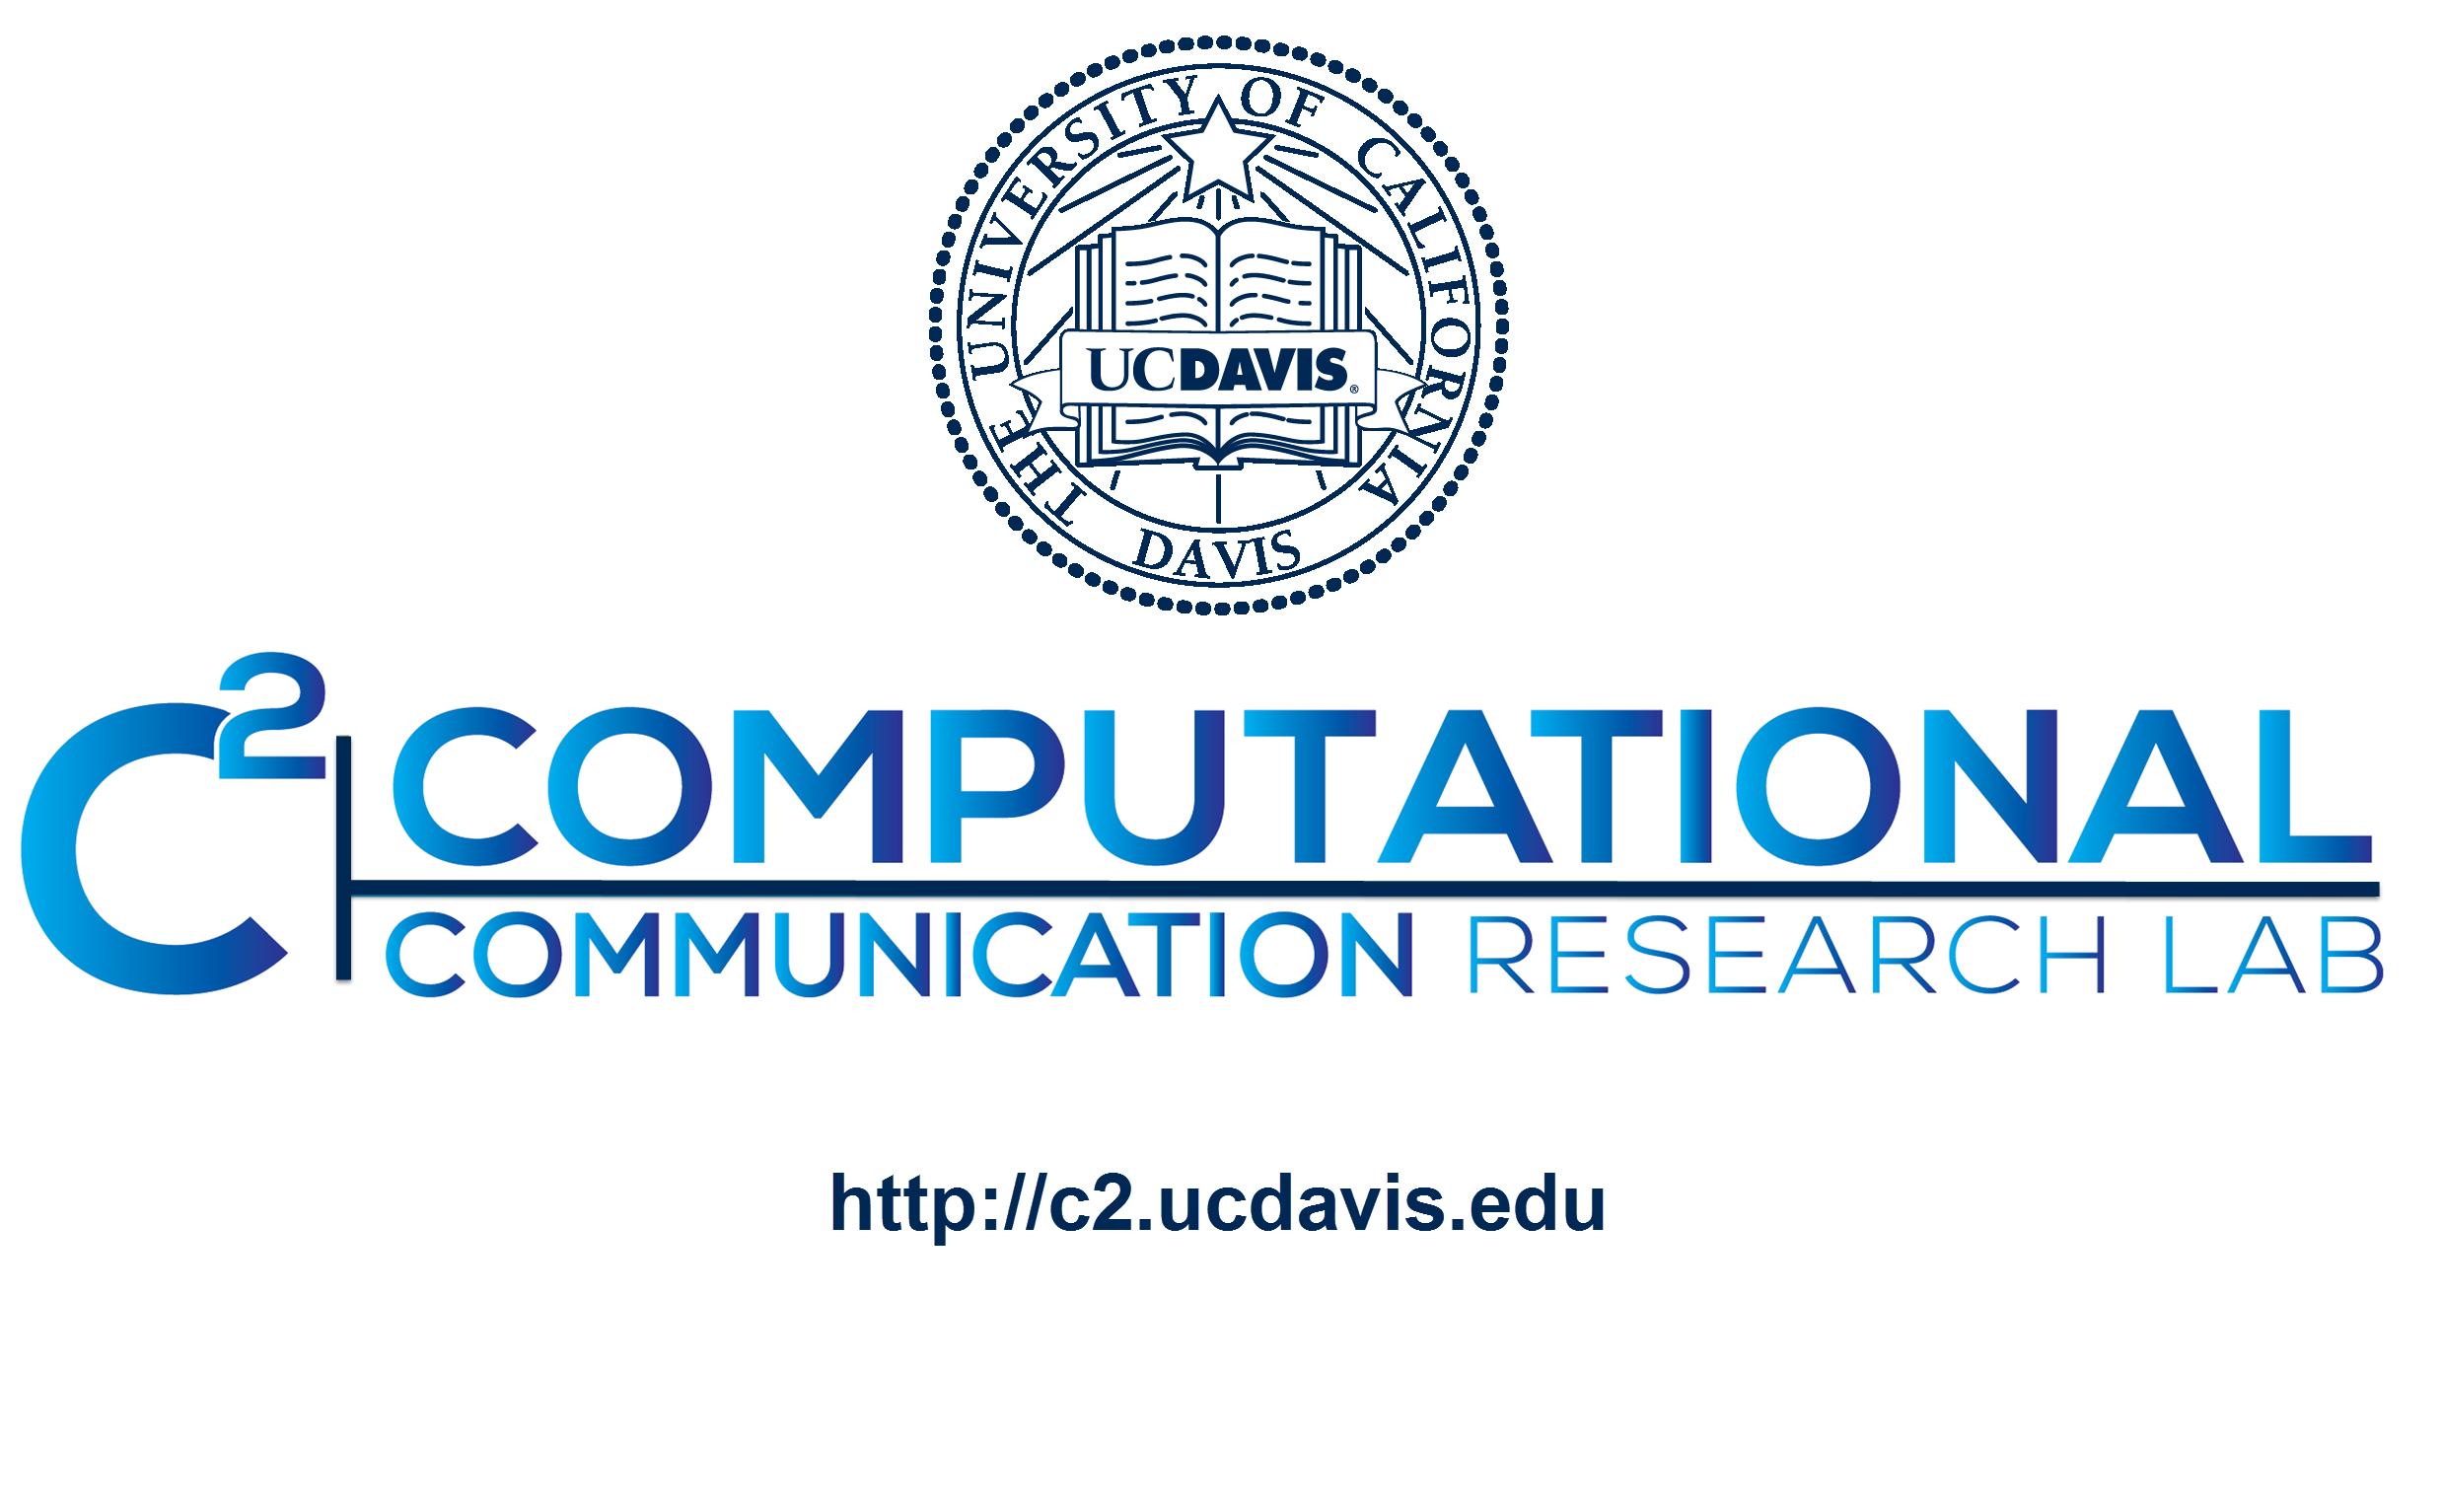 C^2 Journal Club: Social Media & Big Data